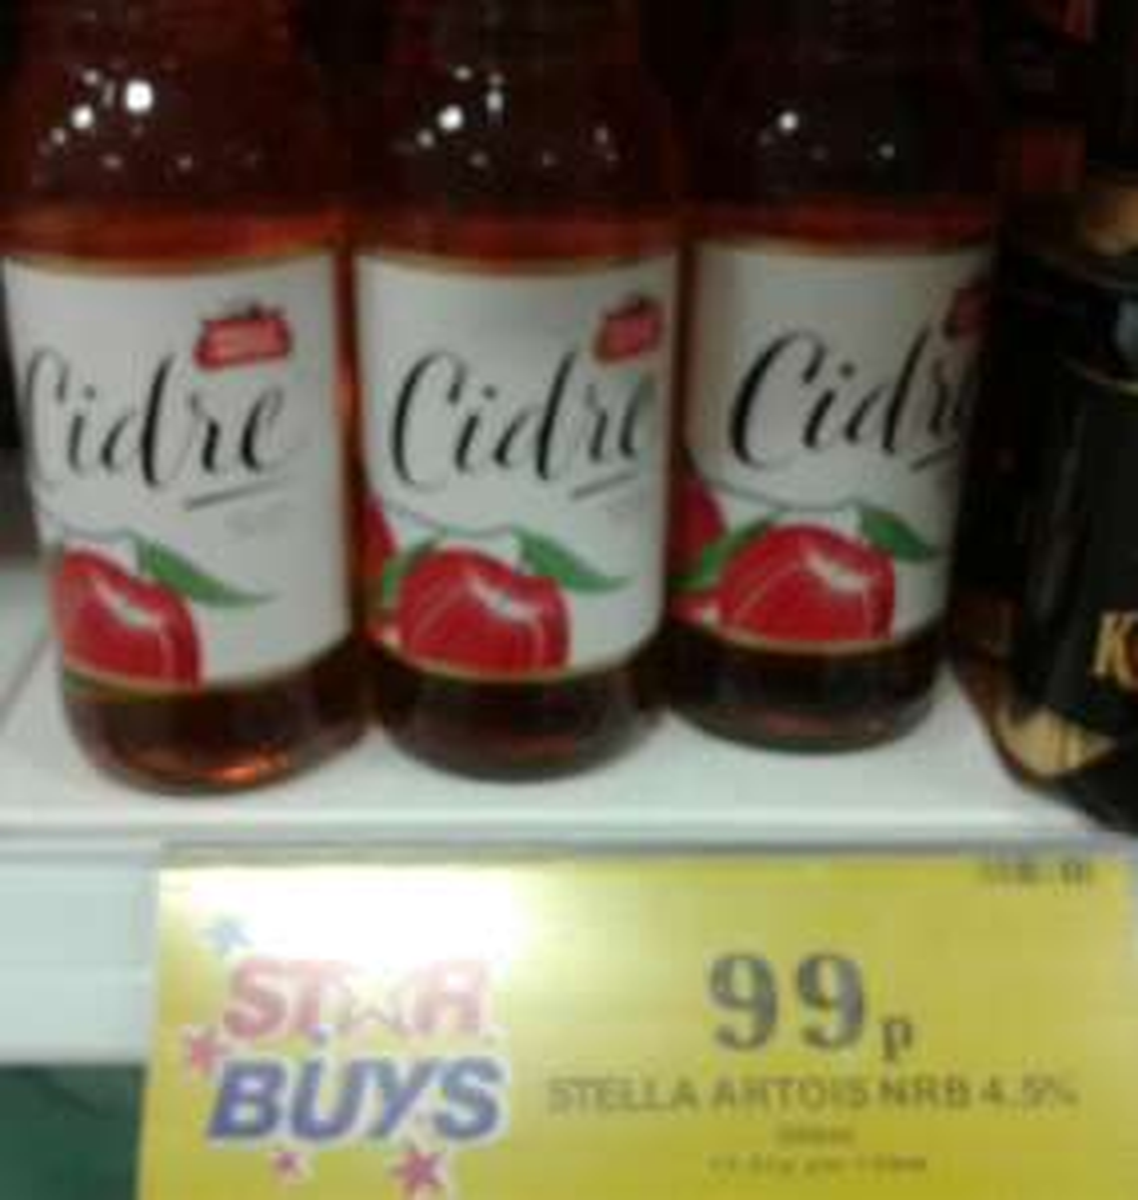 Stella Artois Cidre 500ml  99p  at Home Bargains, New Brighton In-store